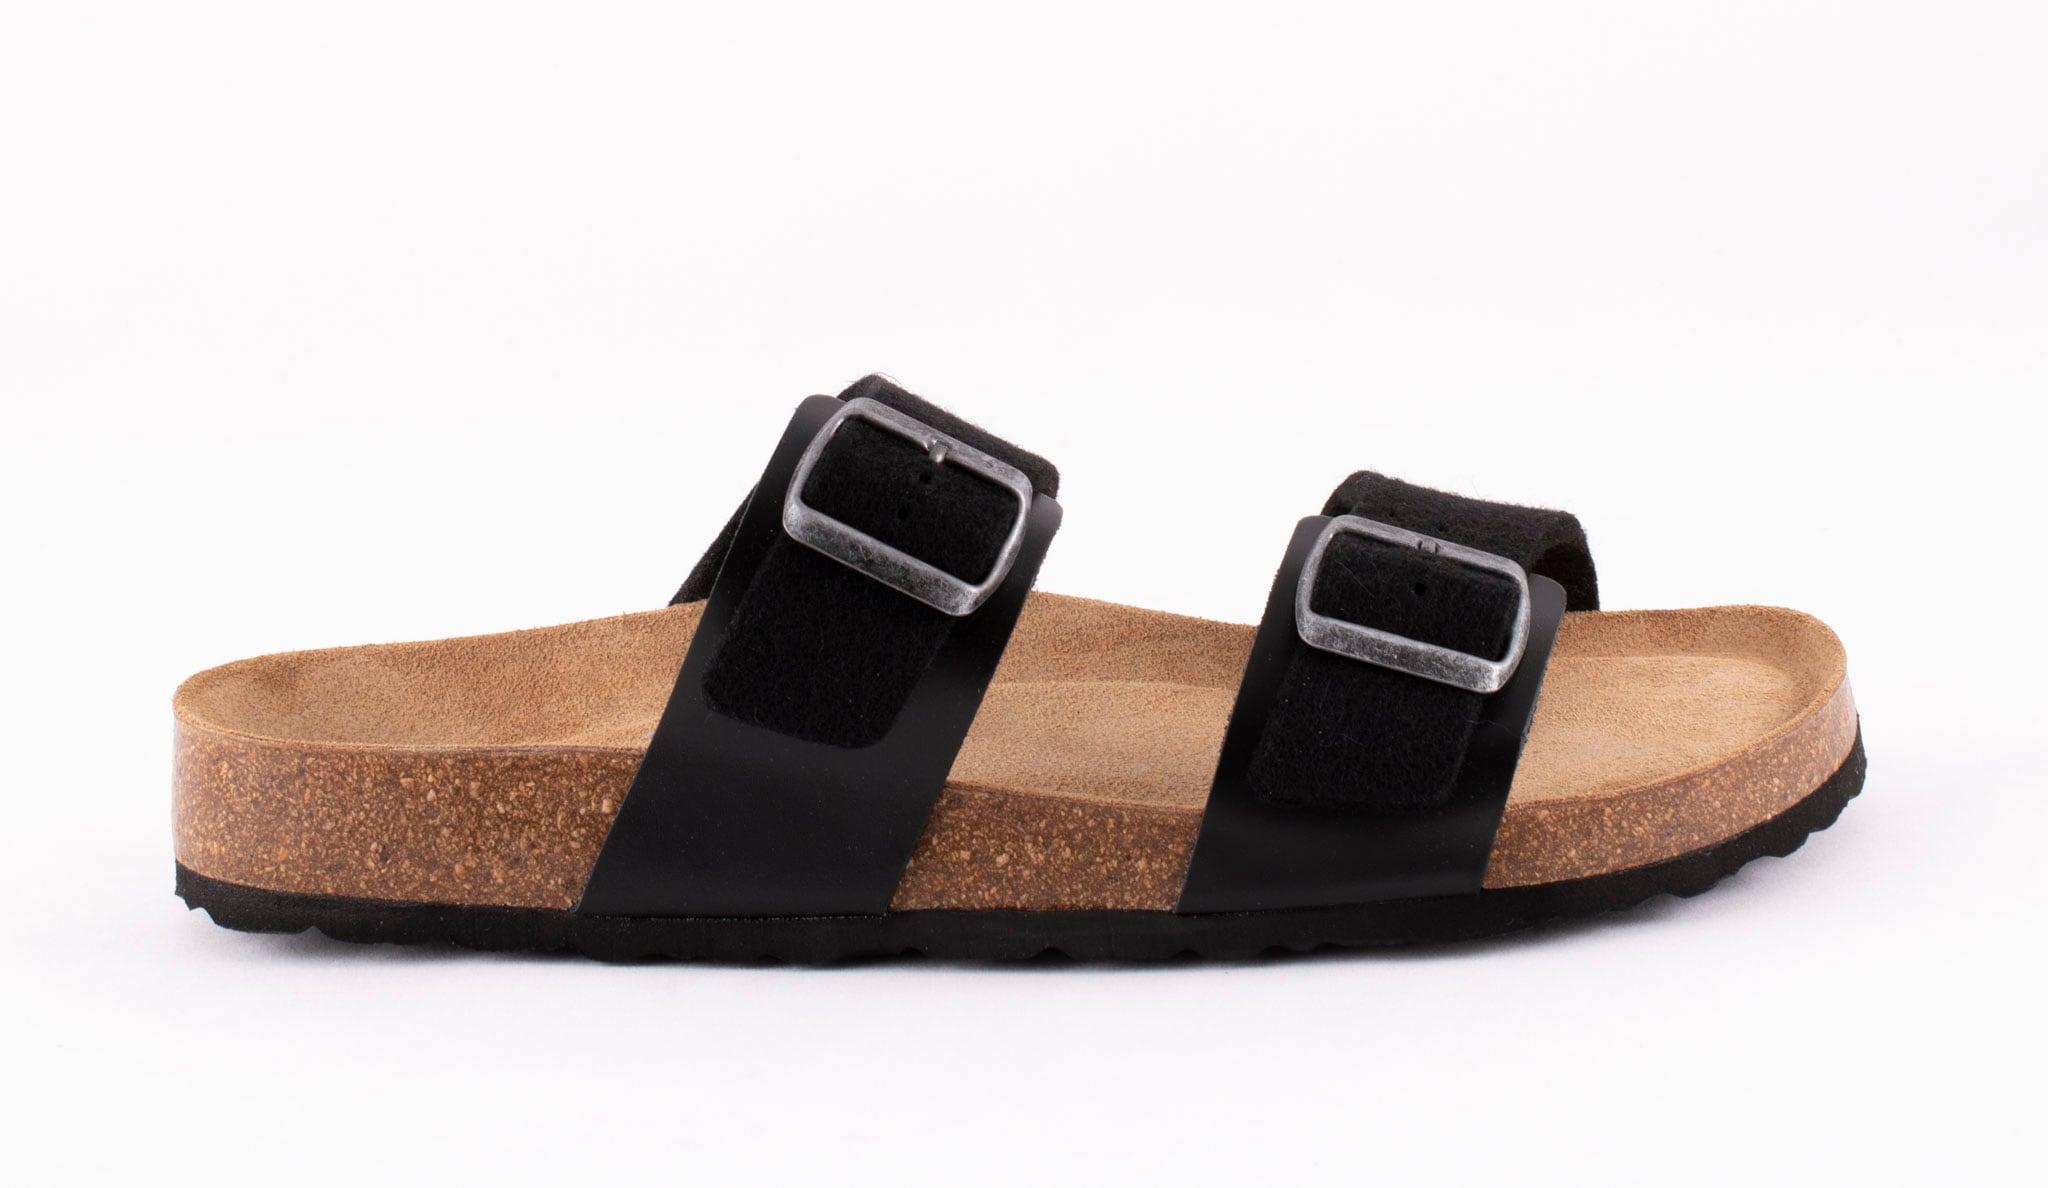 Christian sandals